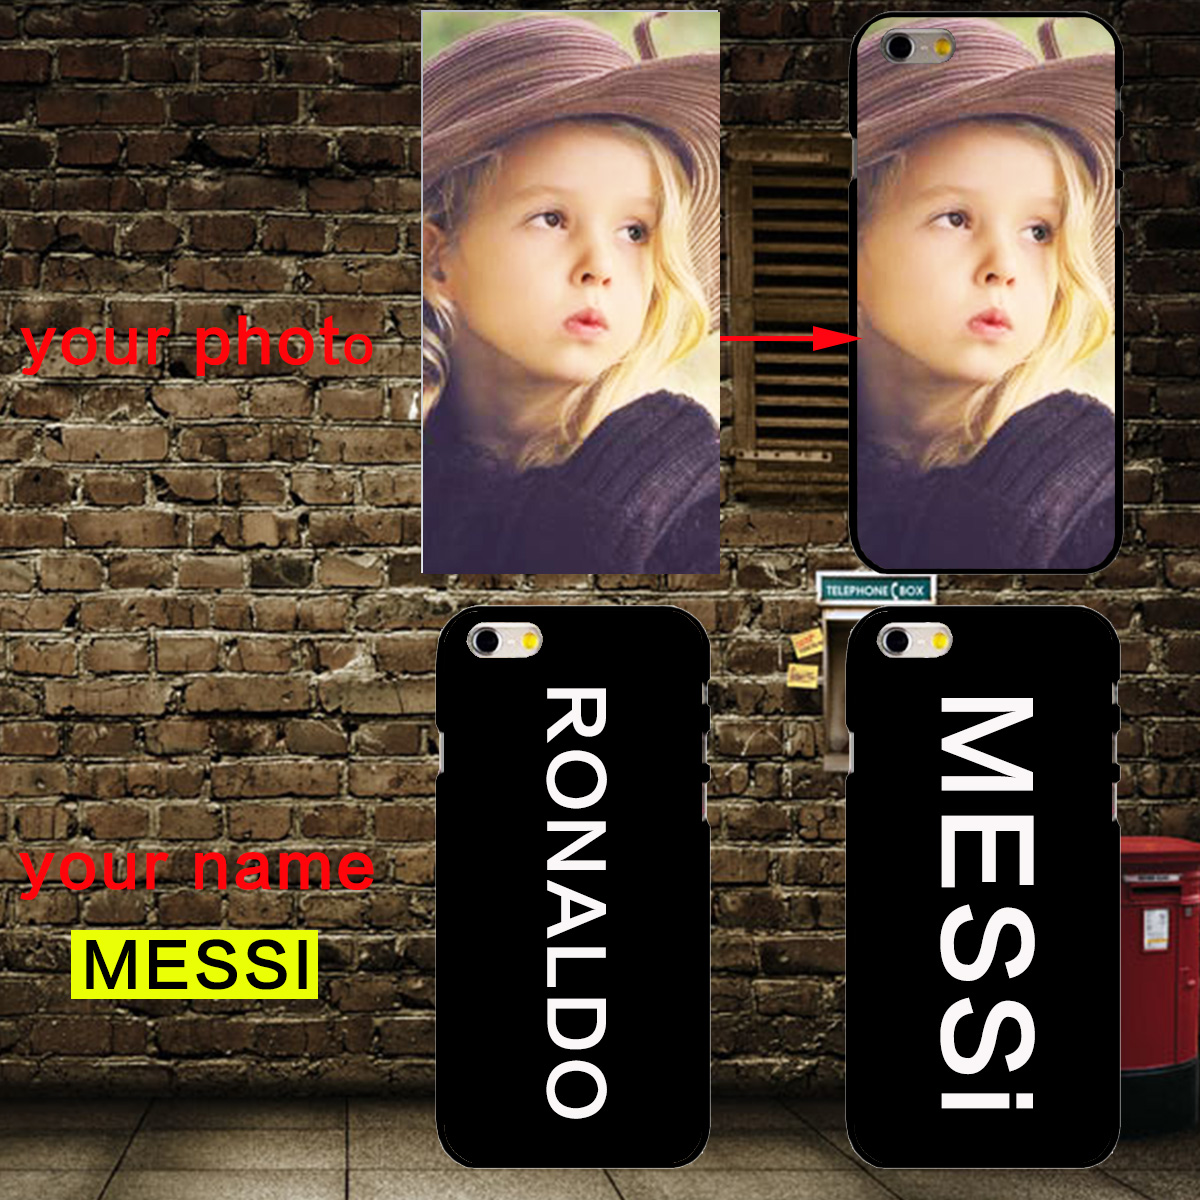 Carmelo Anthony Silicone Case For LG G5 G6 K4 K8 K10 2017 EU 2018 For HTC M9 M10 Desire 626 820 826 12 Plus U12 H512